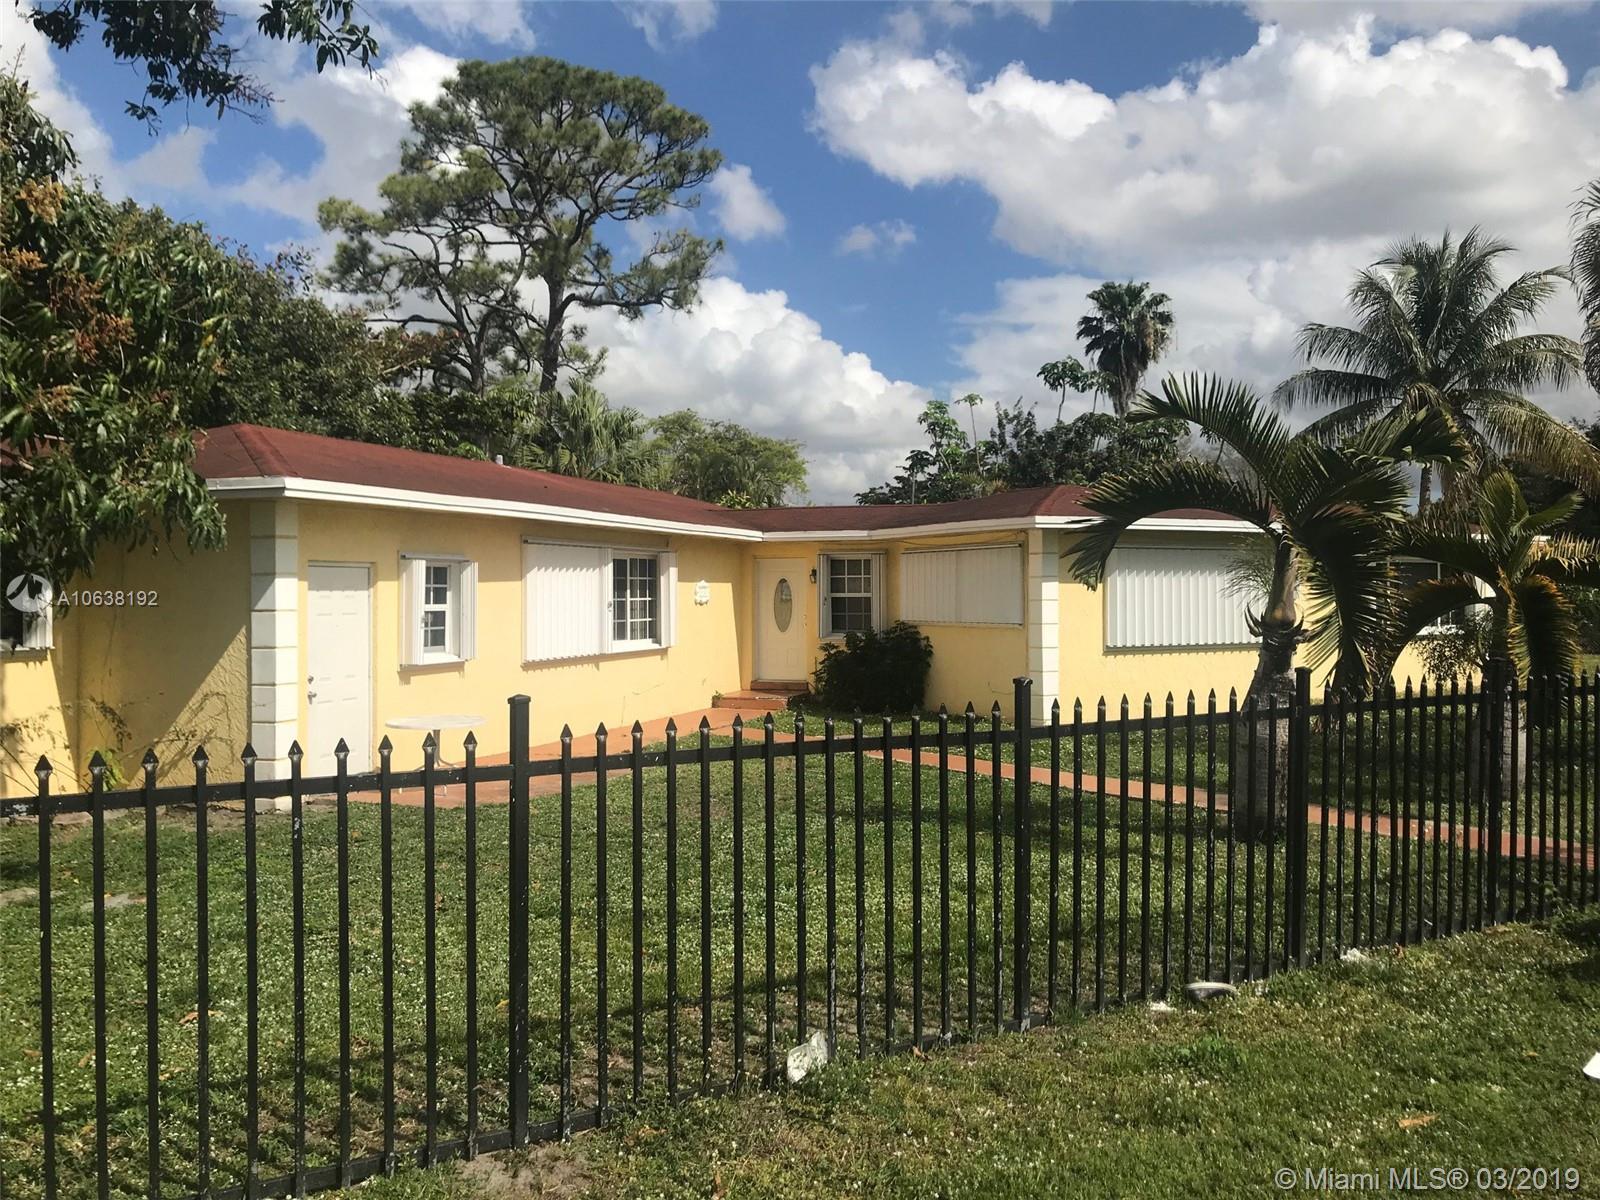 1251 NW 147 St, Miami, FL 33167